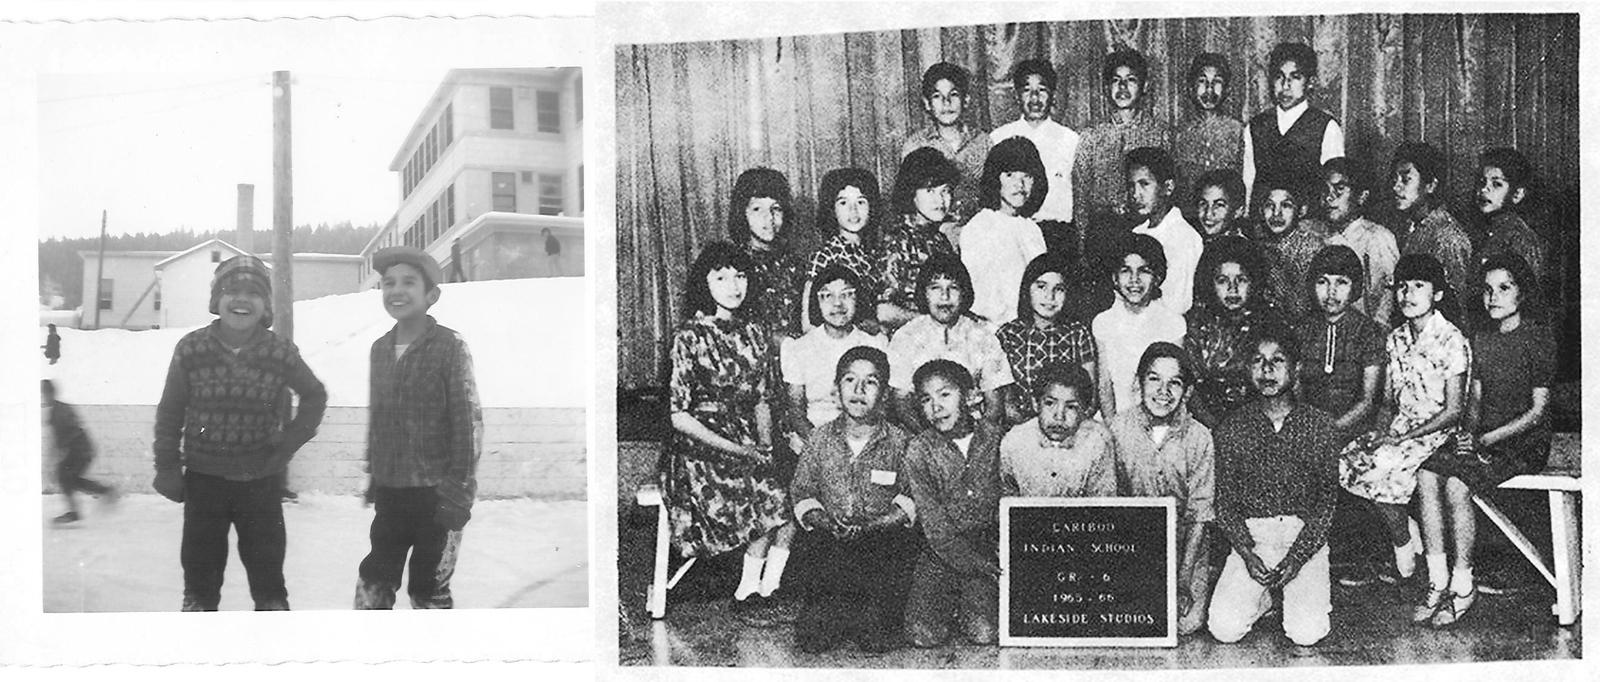 memories of residential school in british columbia